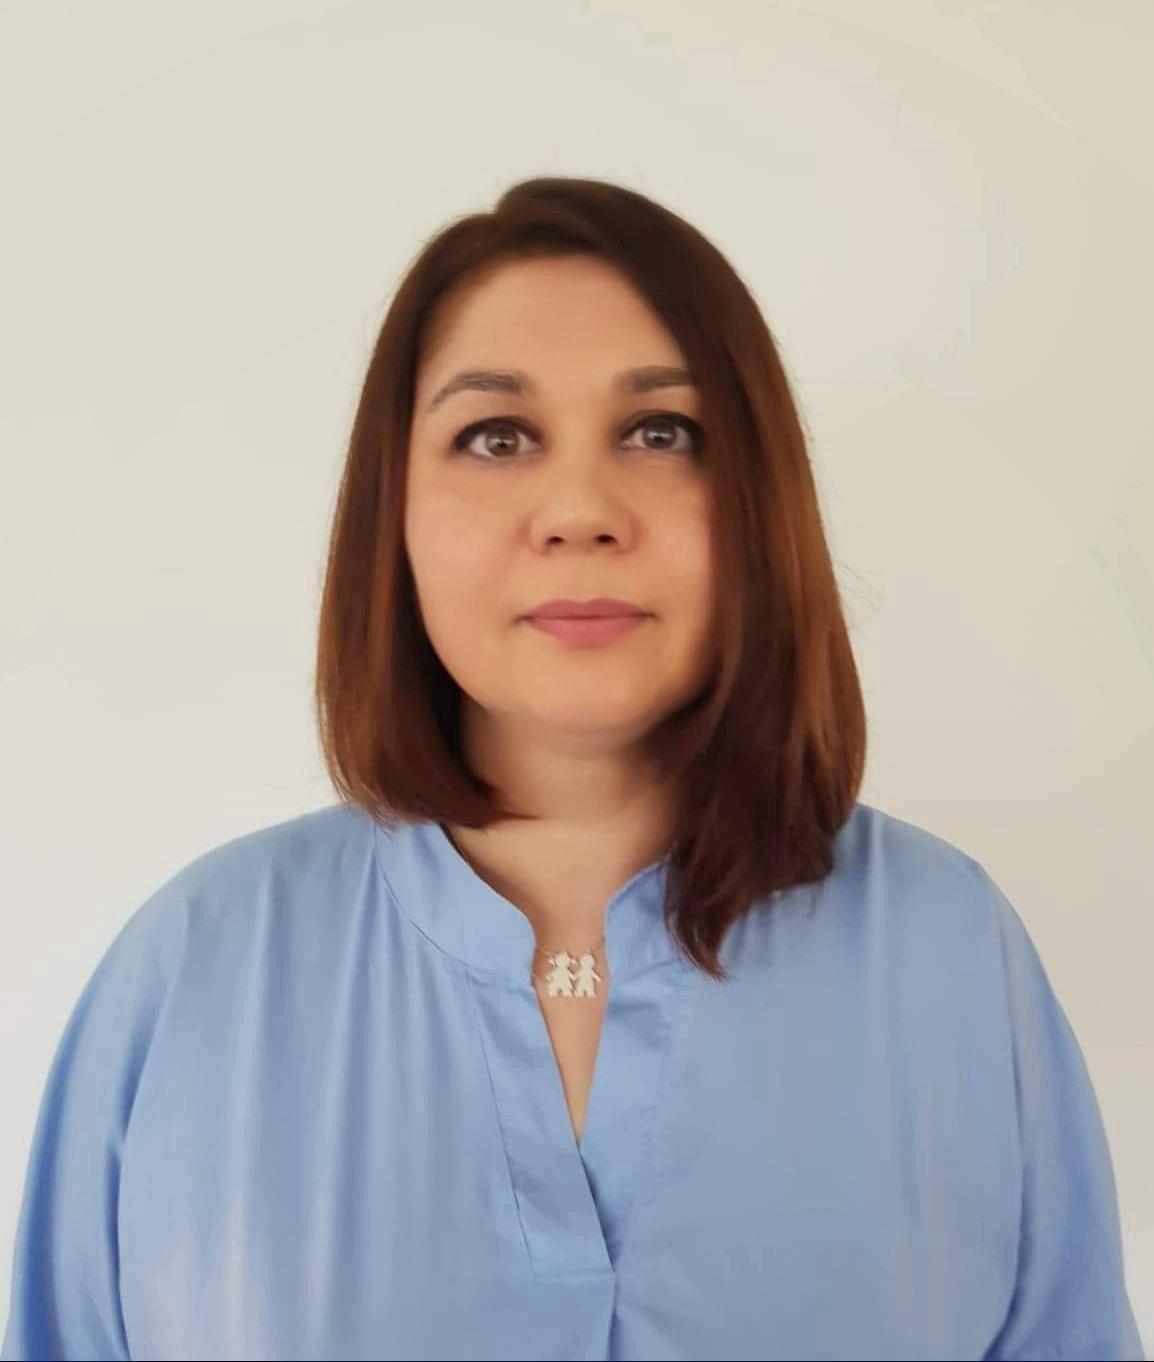 Lixandru Mariana Lucica